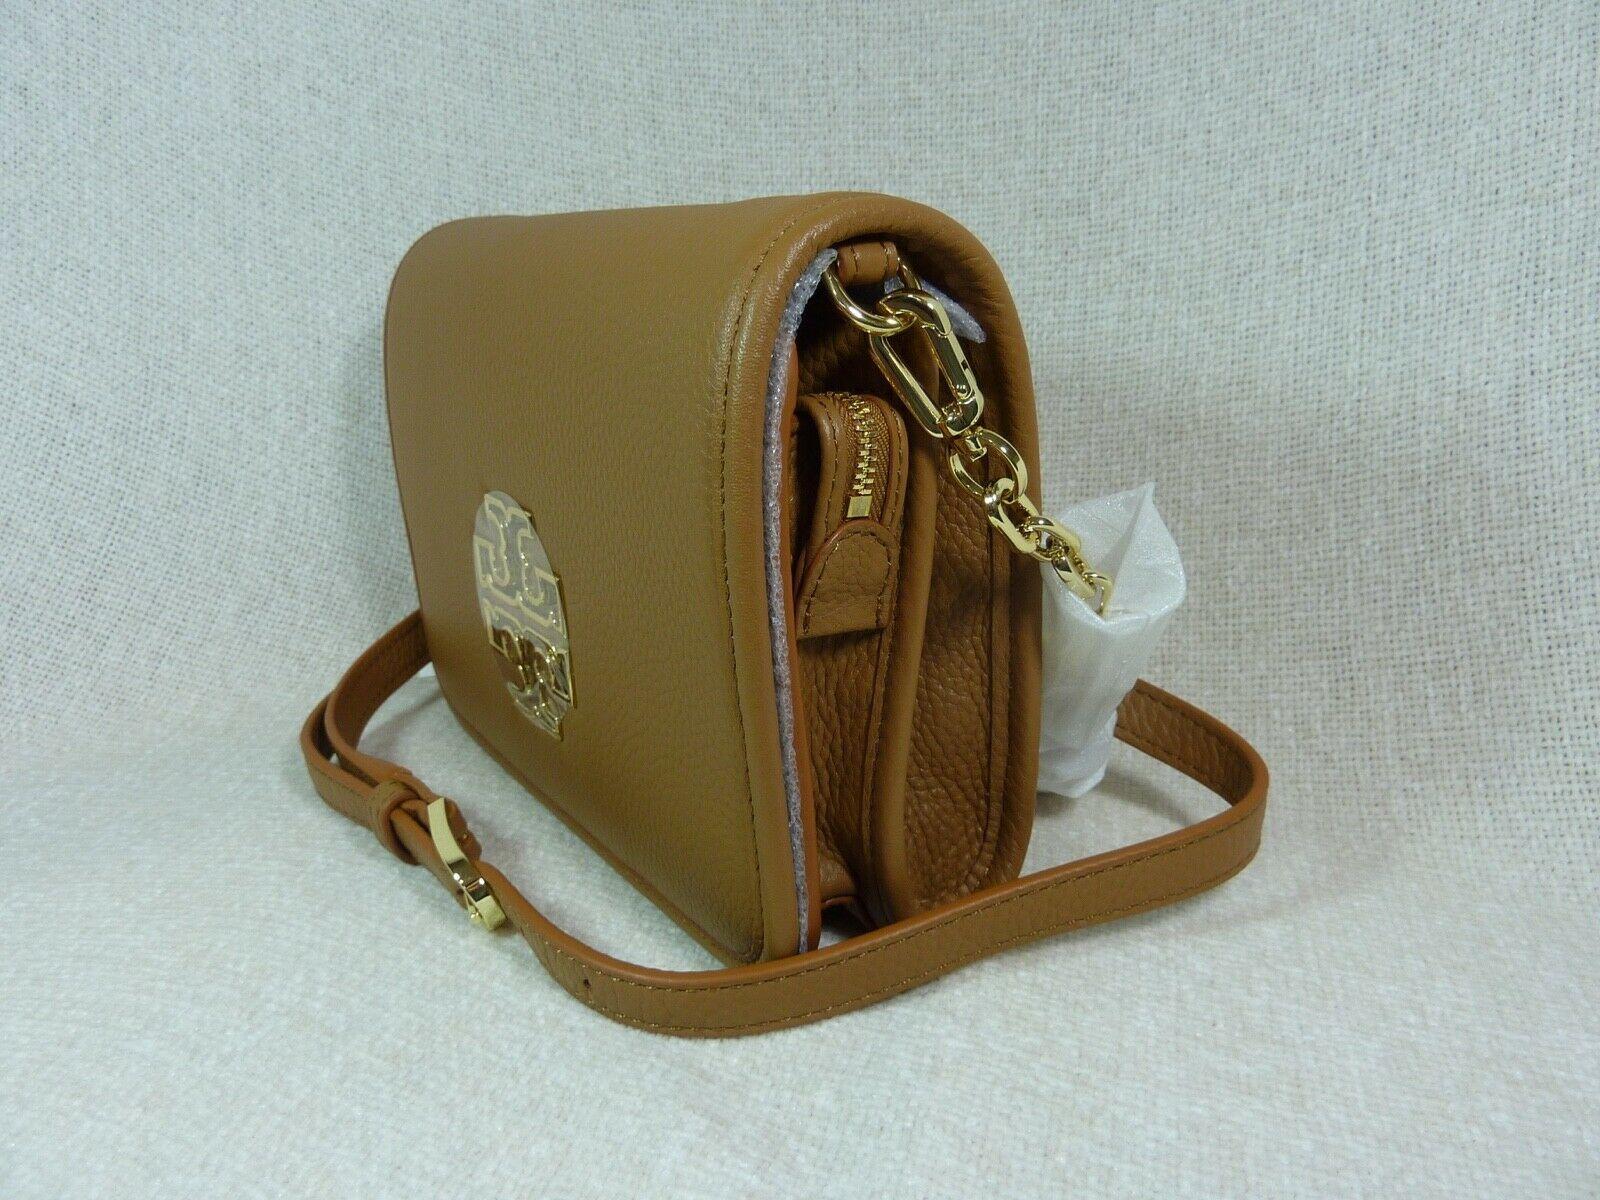 NWT Tory Burch Bark Leather Britten Combo Cross Body bag/Clutch  - $425 image 2